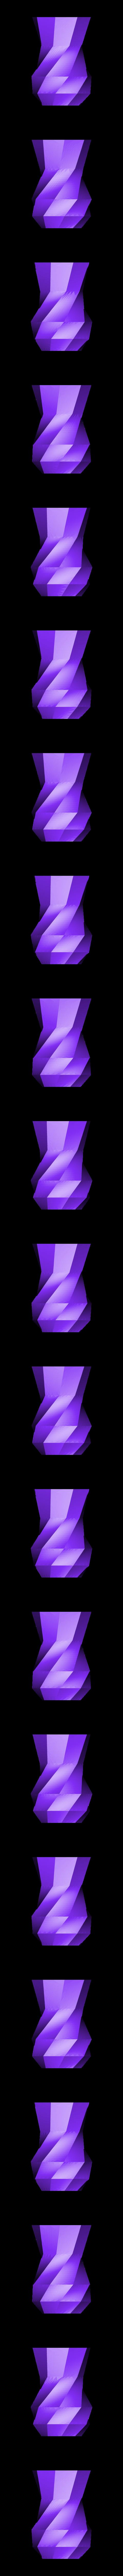 Non_Vase_Mode.stl Download STL file Faceted Vase • 3D print object, 3DPrintingGurus